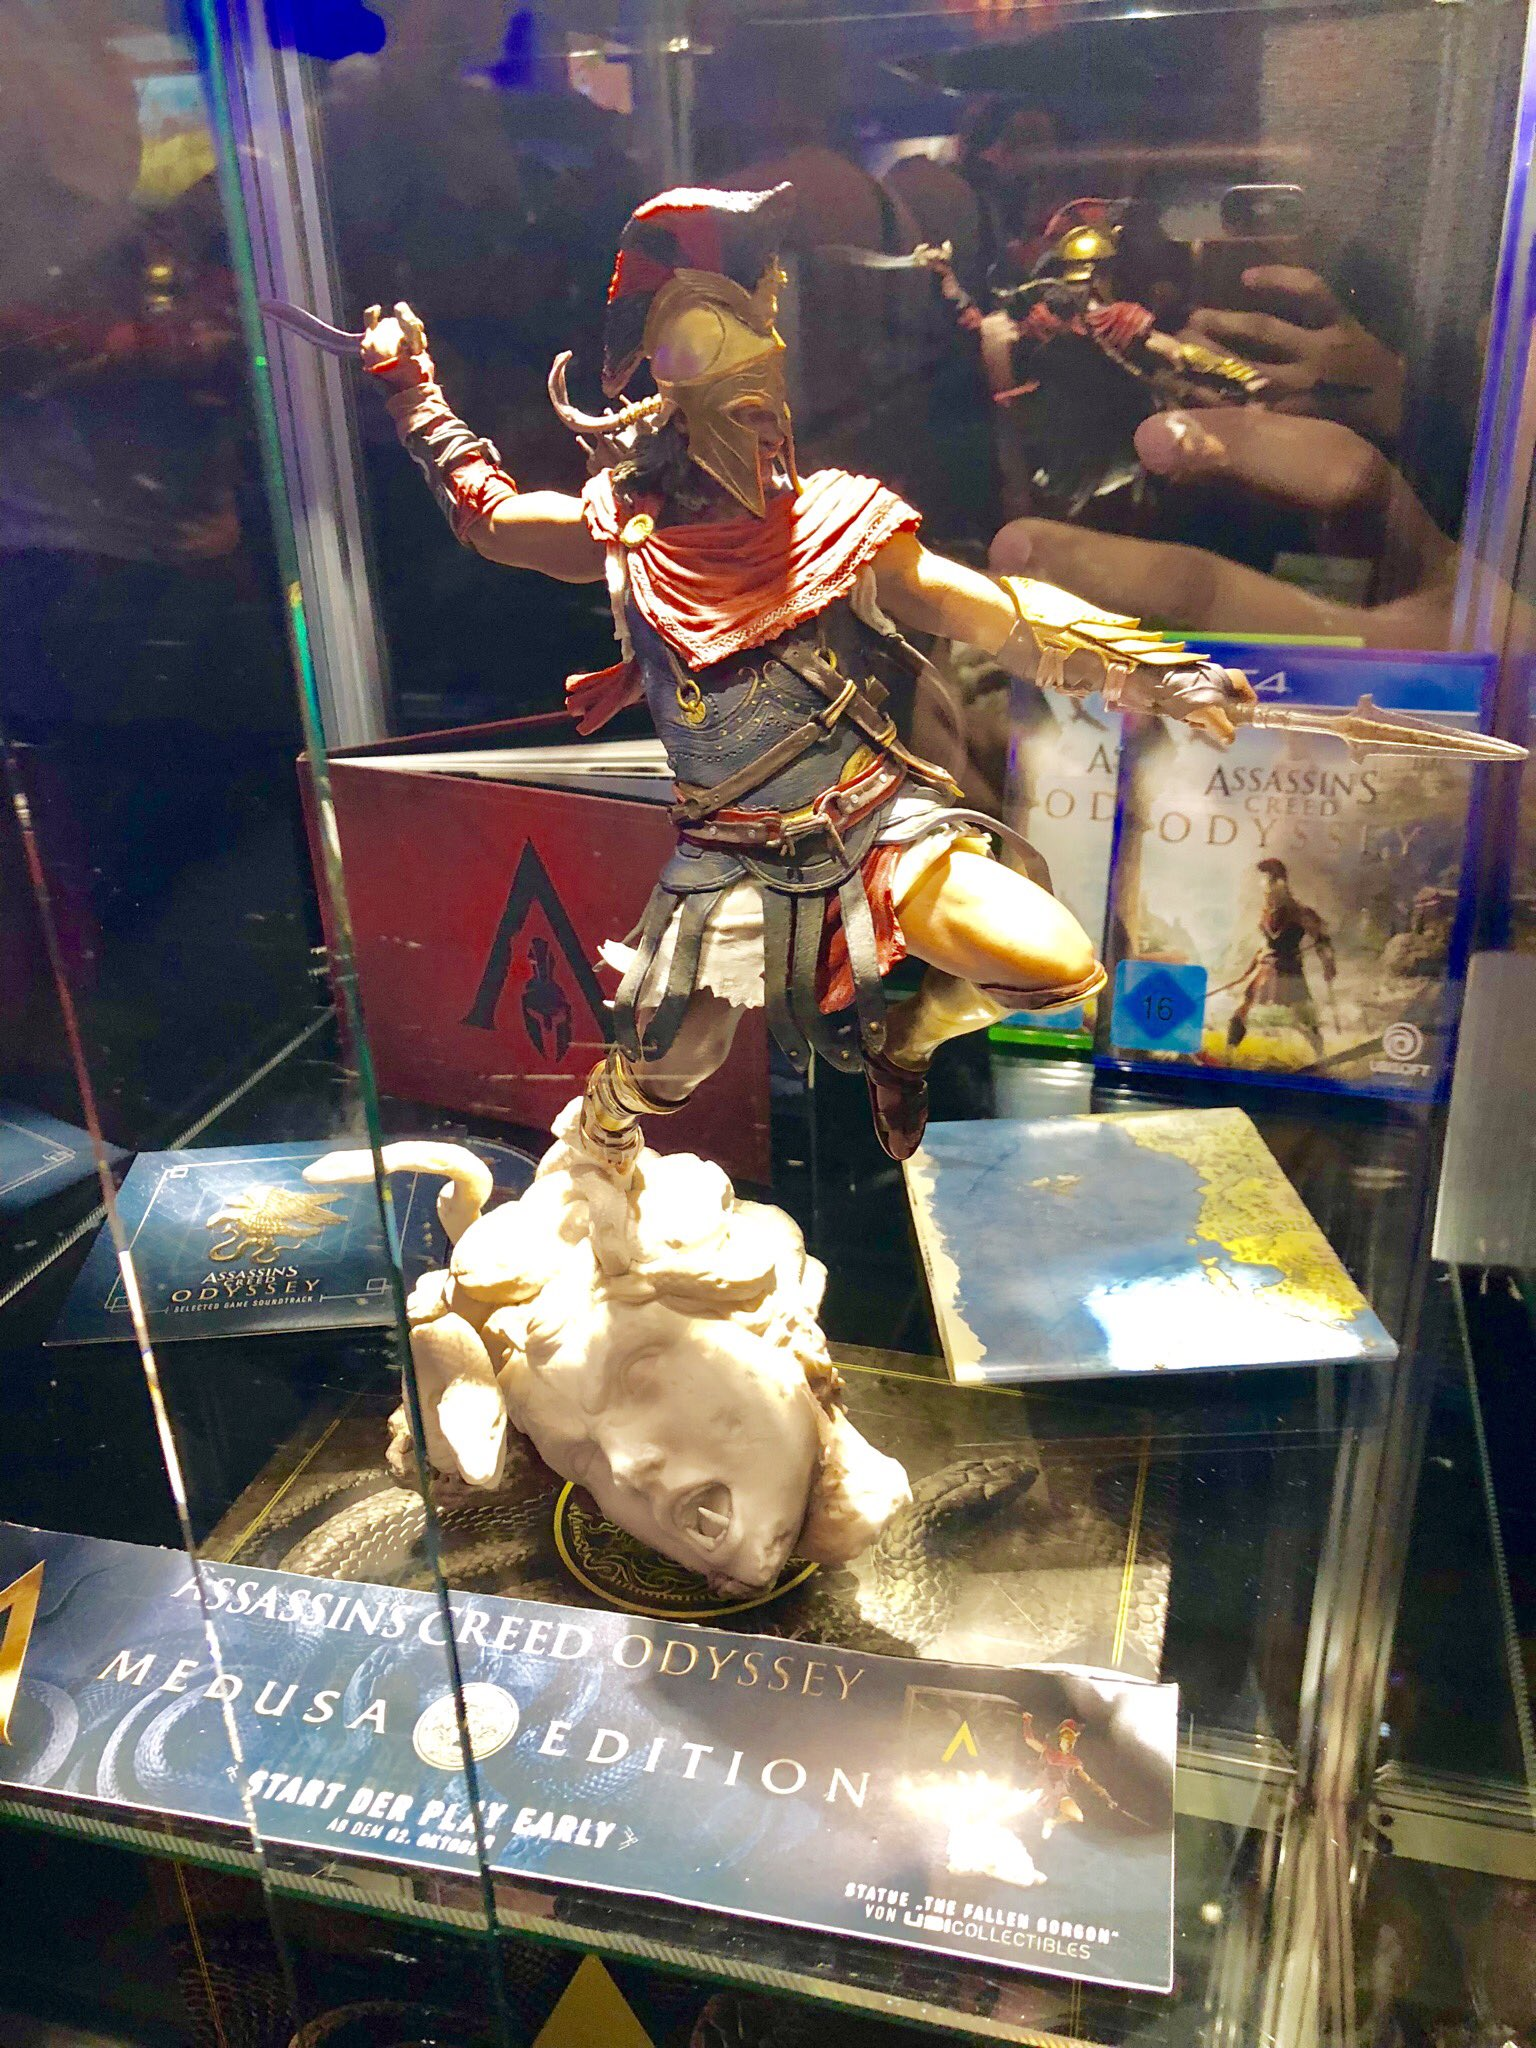 Assassin's Creed Odyssey Medusa : assassin's, creed, odyssey, medusa, Games, Australia, Twitter:,